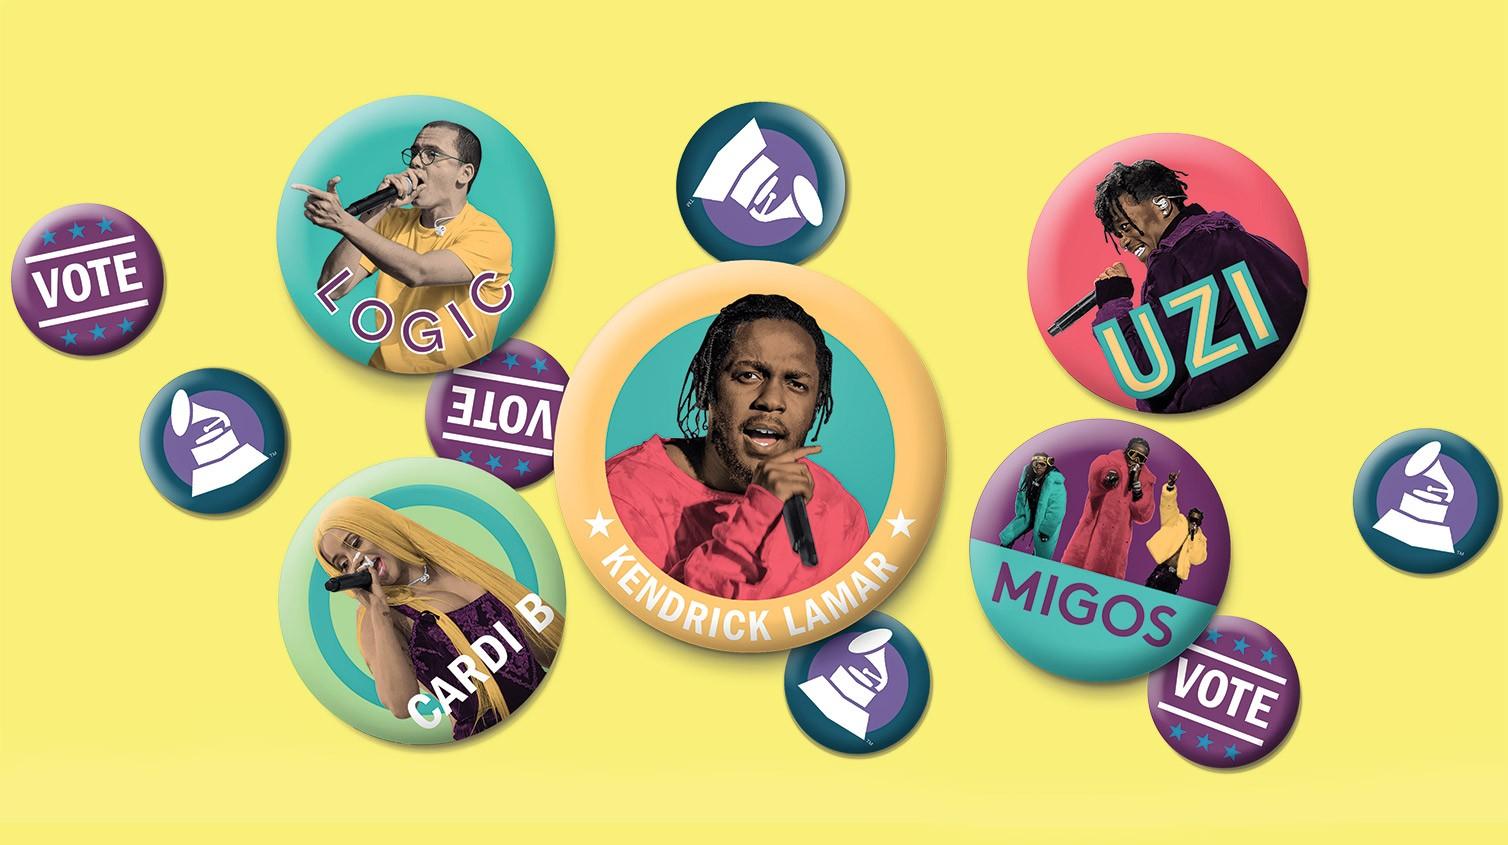 Clockwise from top left: Logic, Lil Uzi Vert, Migos, Lamar and CardiB.